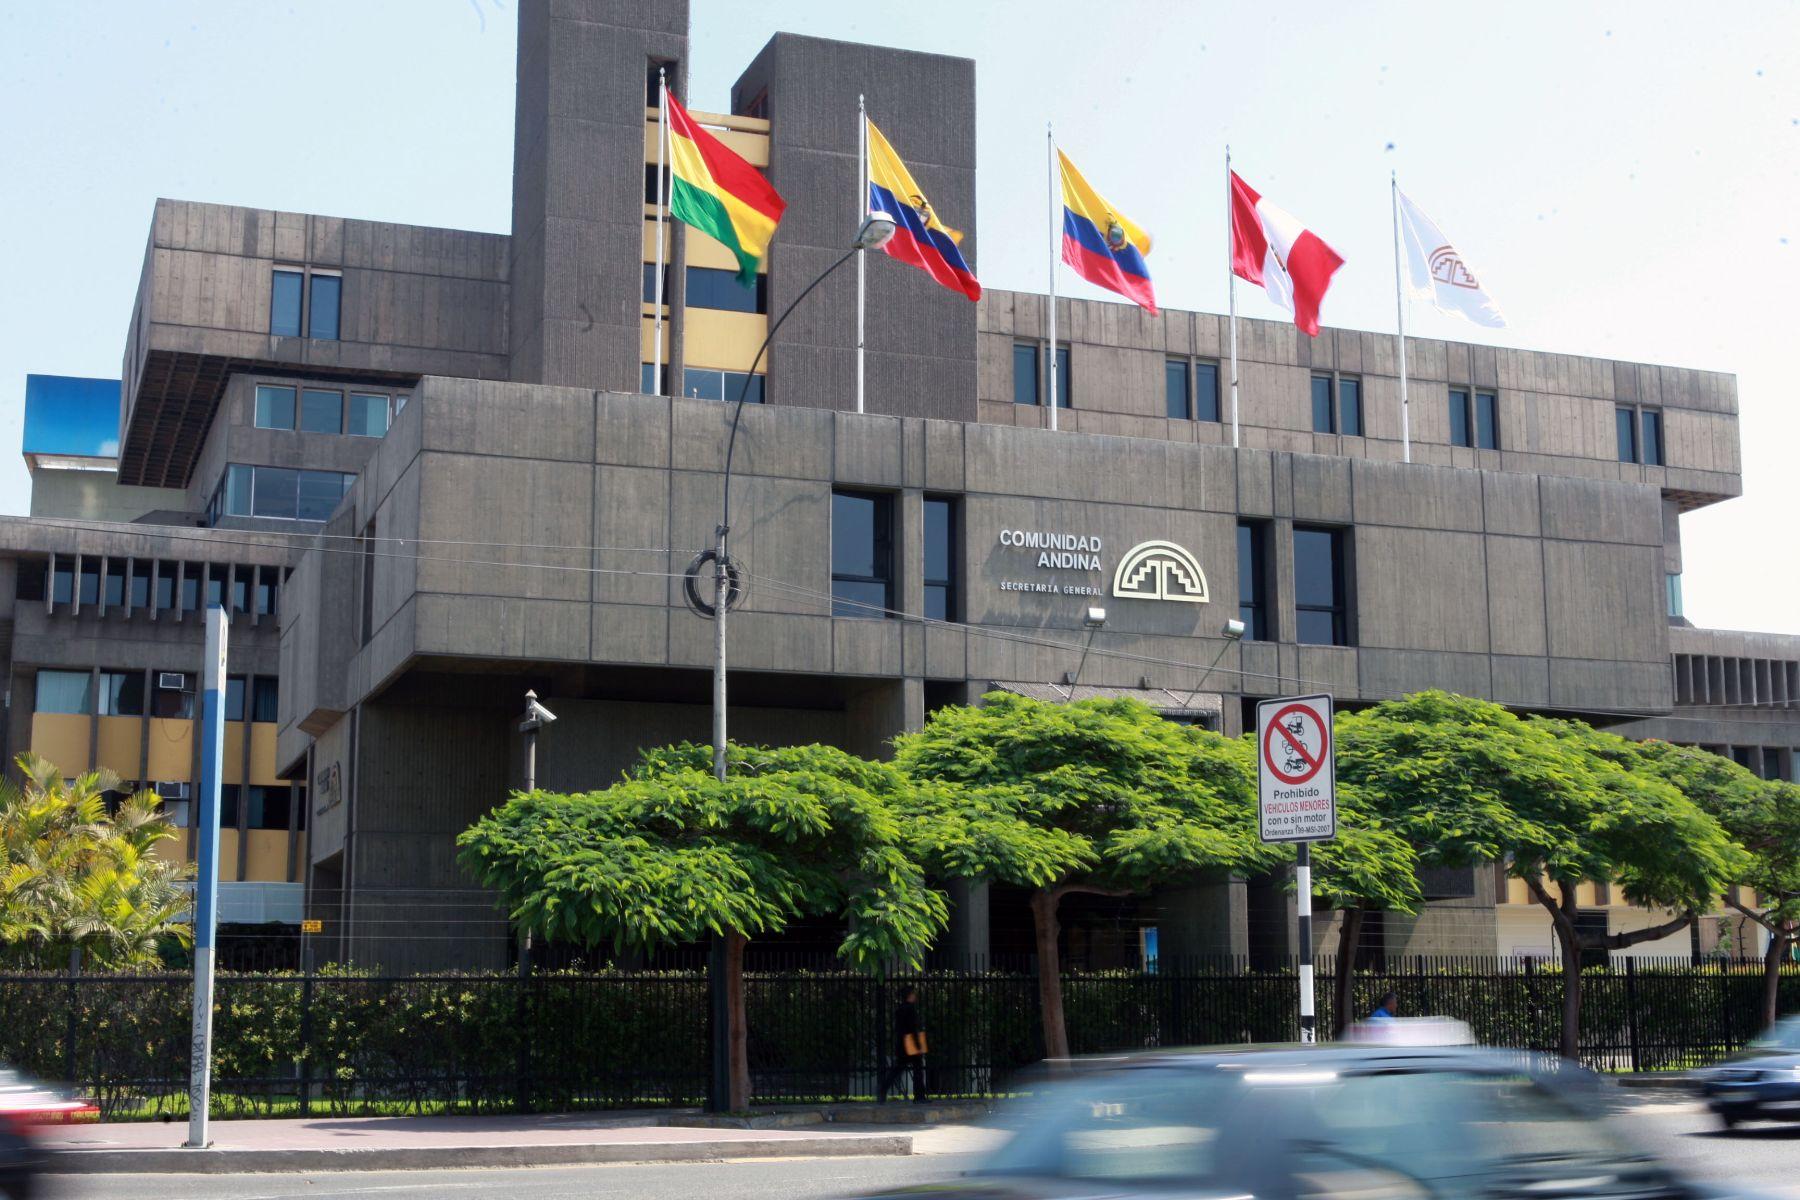 Sede de la Comunidad Andina (CAN) en Lima. ANDINA/Norman Córdova